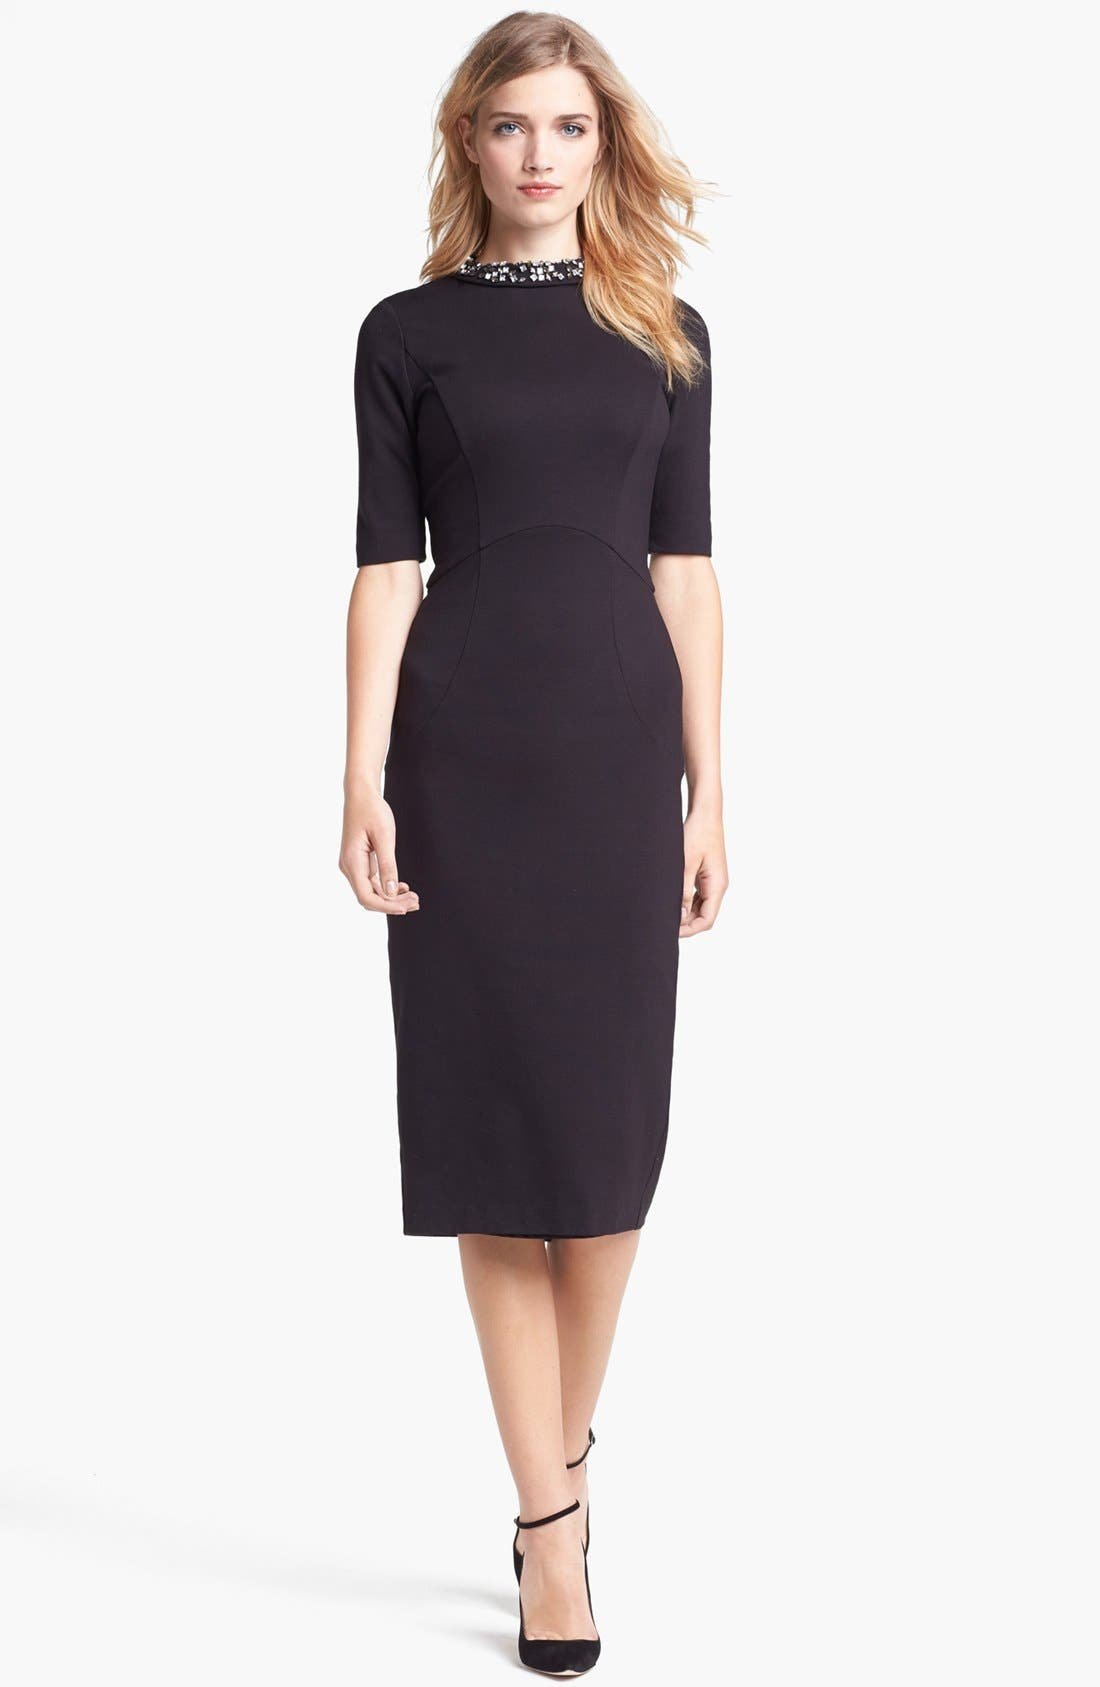 Alternate Image 1 Selected - Ted Baker London Stretch Knit Midi Dress